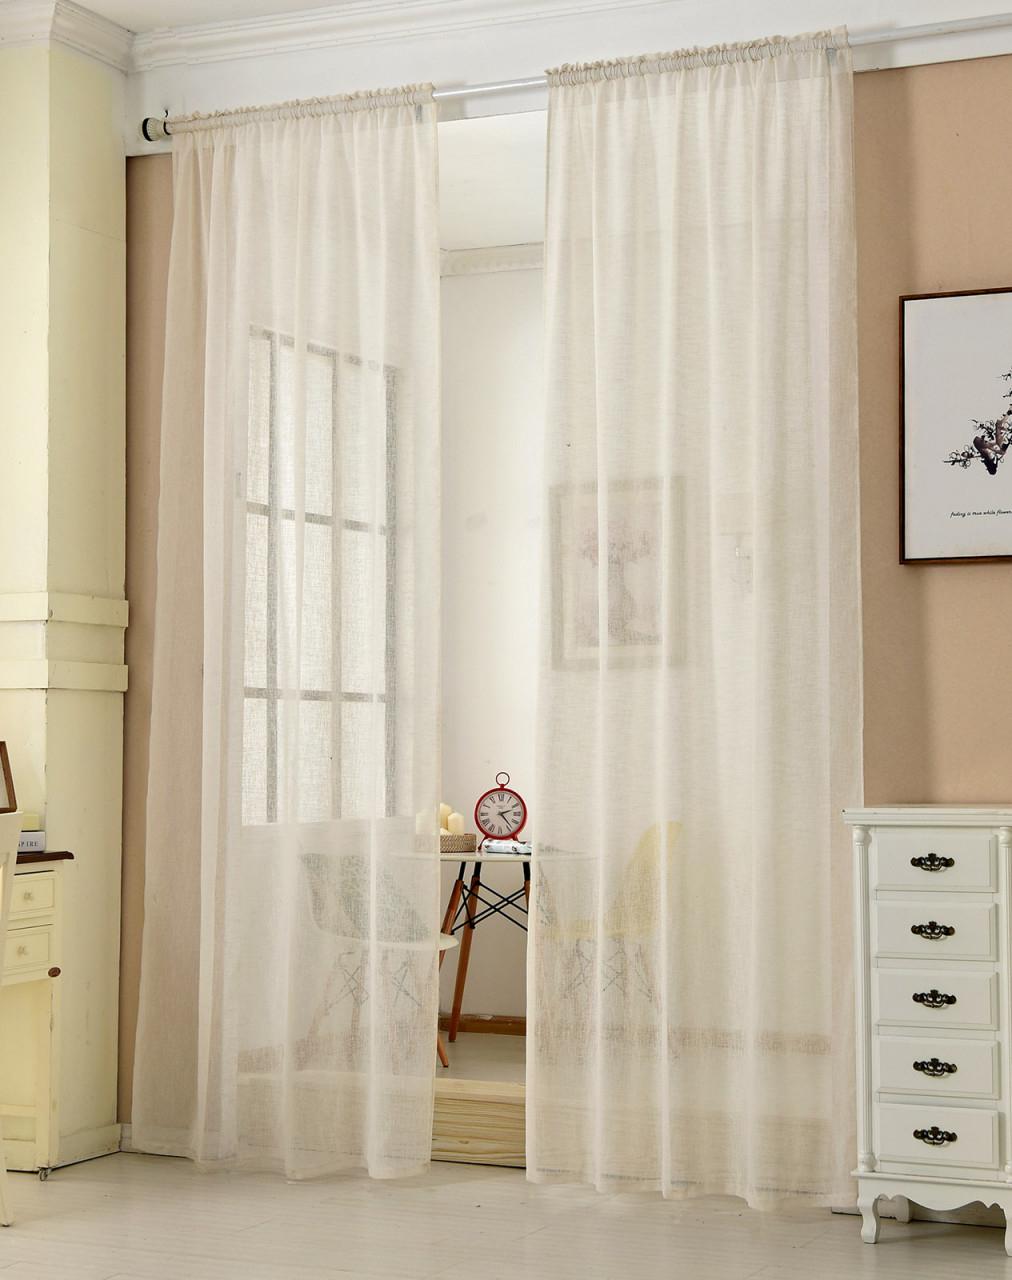 Gardinen Transparent Mit Kräuselband Leinen Optik von Wohnzimmer Gardinen Mit Kräuselband Bild